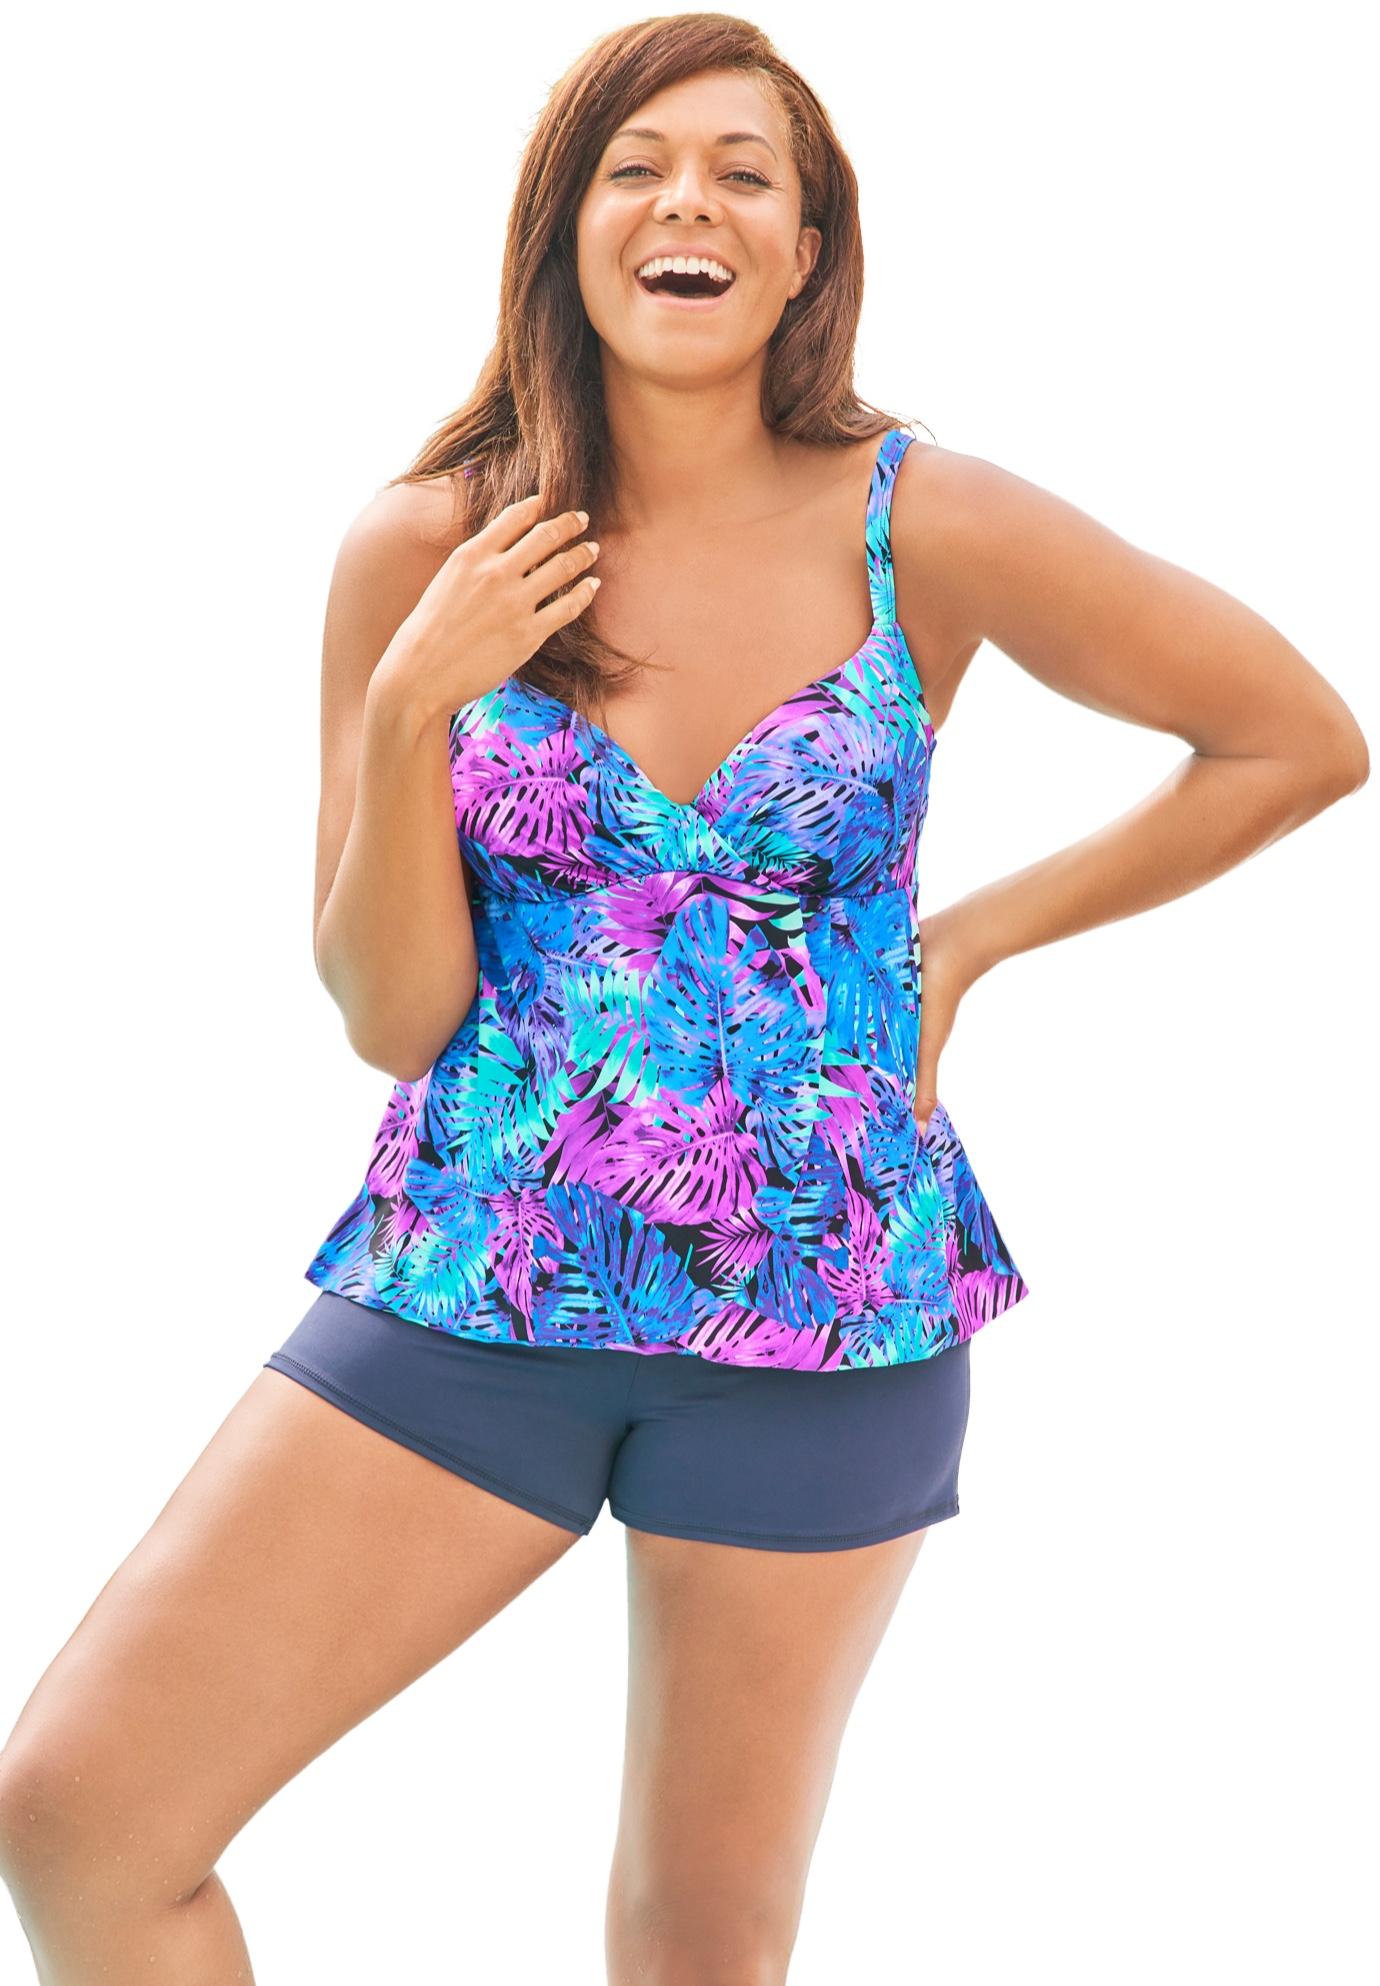 Plus Size Women's Bra-Size Wrap Tankini Top by Swim 365 in Blue Palm Print